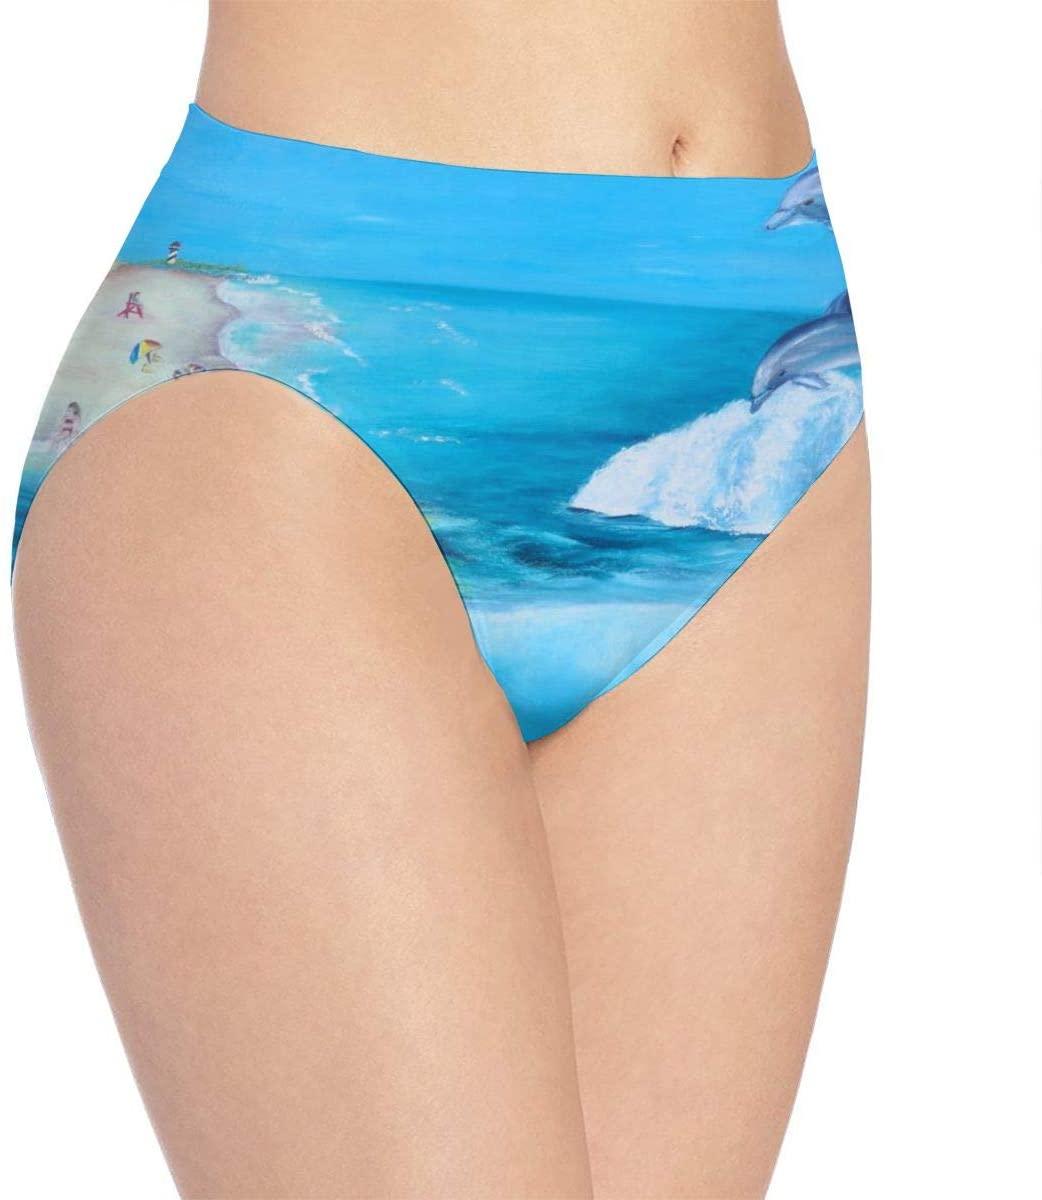 Kjaoi 3D Print Soft Women's Underwear, Sea Tortoise and Dolphin Fashion Flirty Sexy Lady's Panties Briefs Small